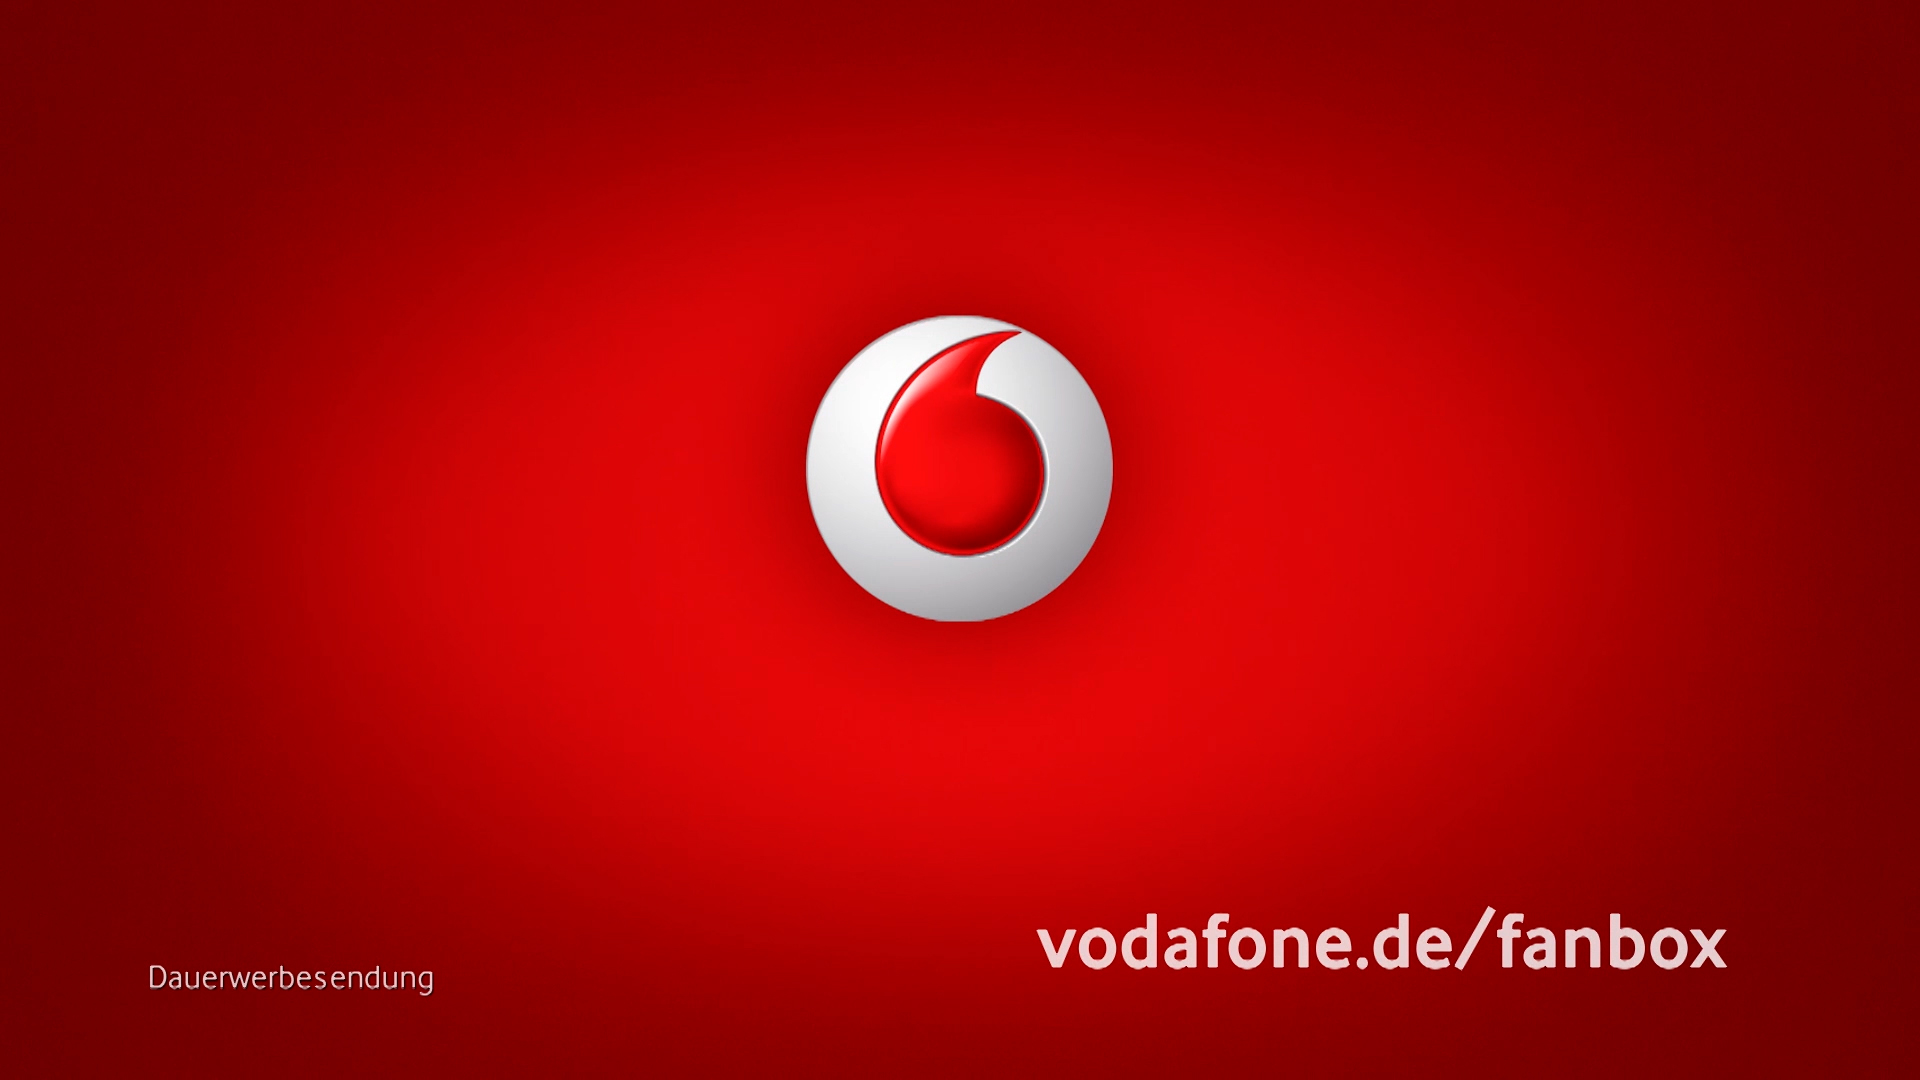 Vodafone Promostory Dauerwerbesendung